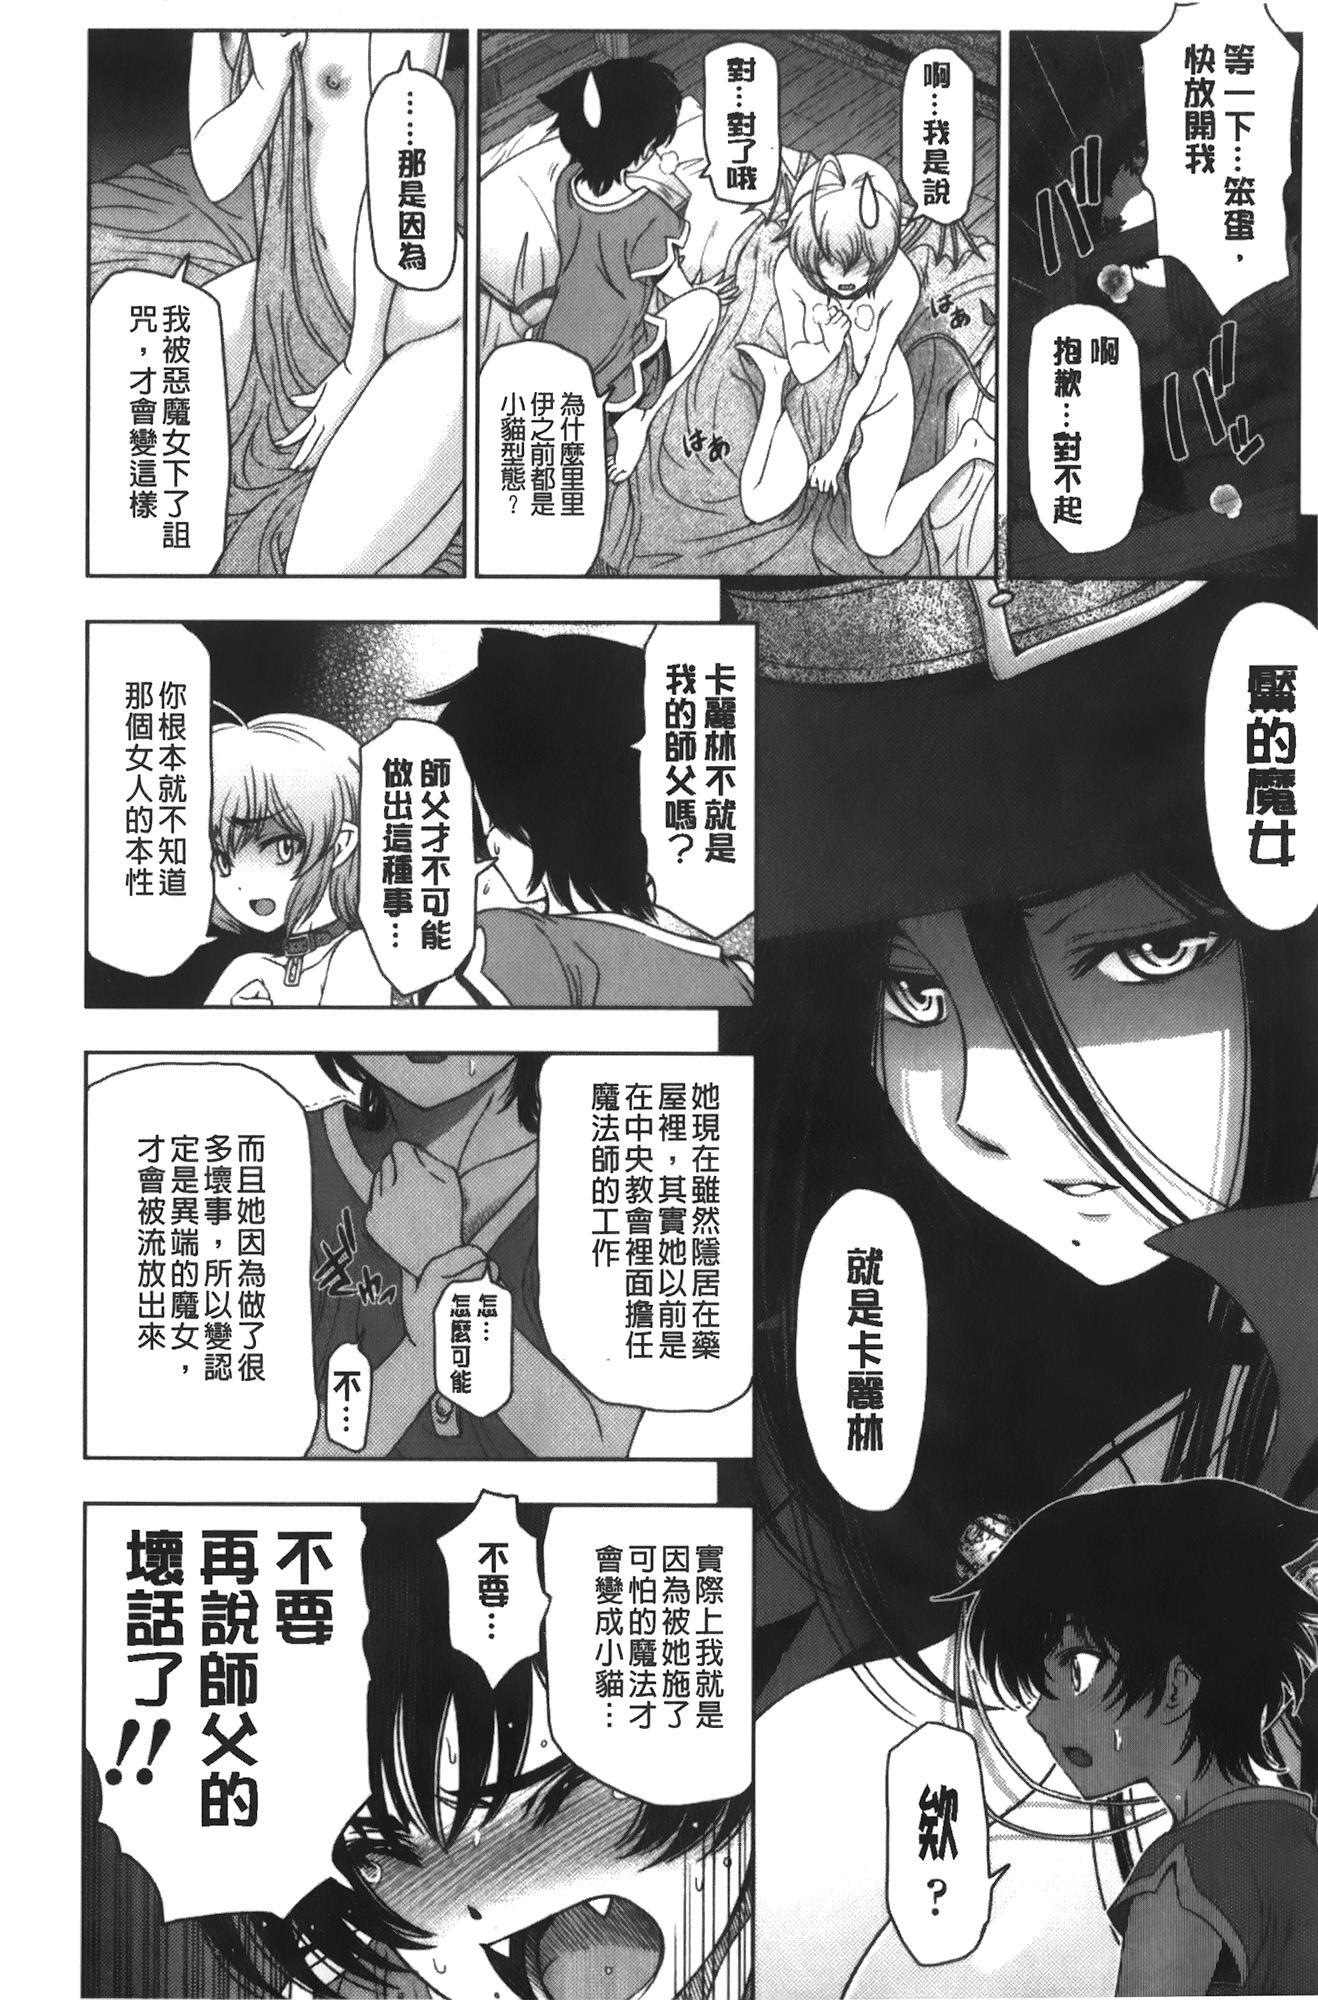 Majo × Shota ~ Genteiban | 魔女X小正太 限定版 36